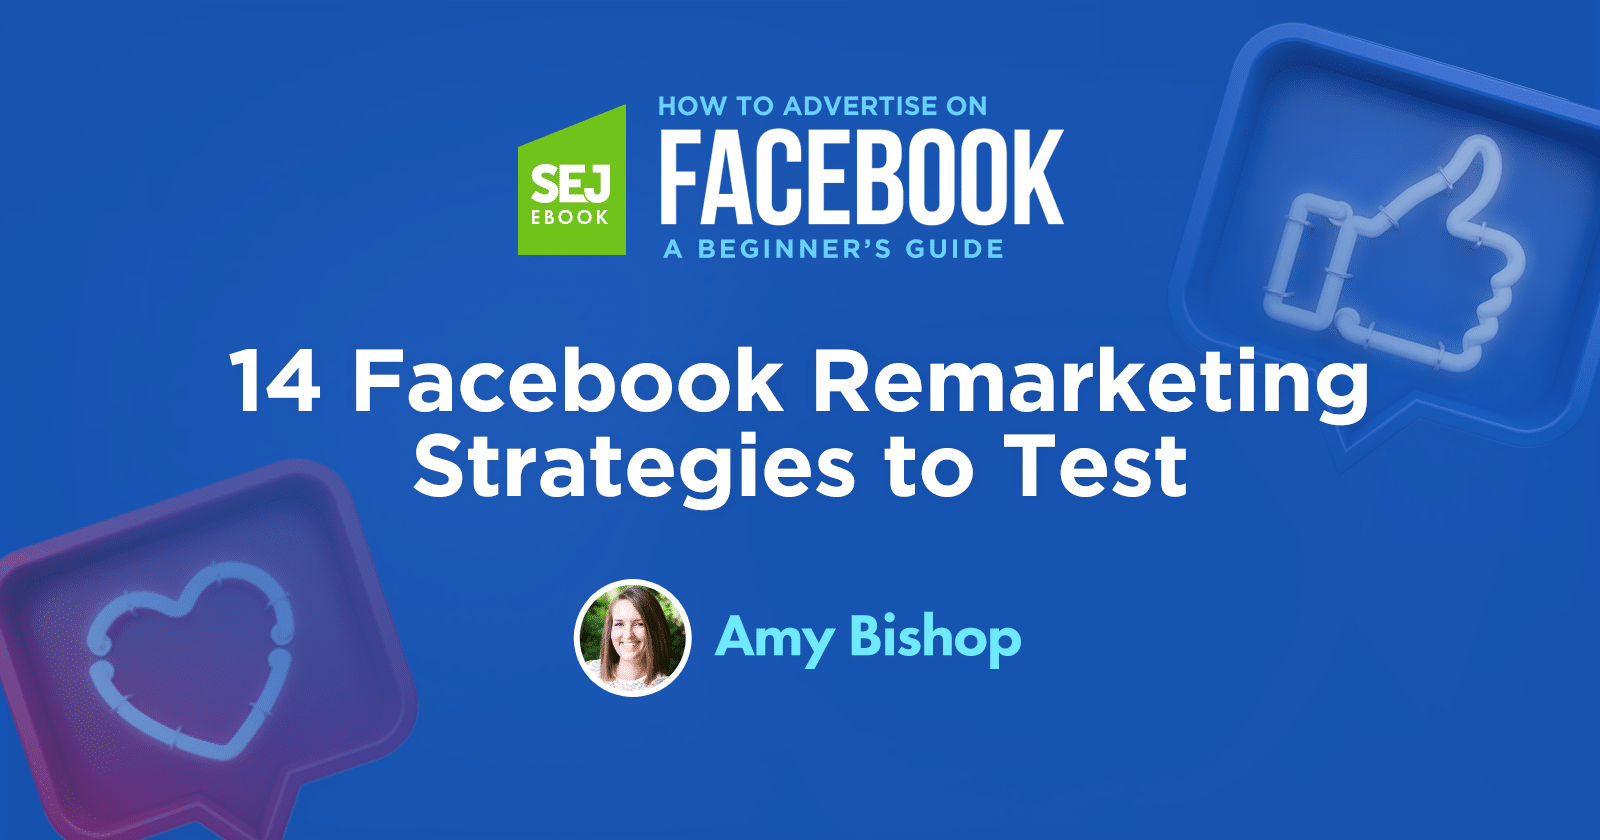 14 Facebook Remarketing Strategies to Test via @sejournal, @hoffman8